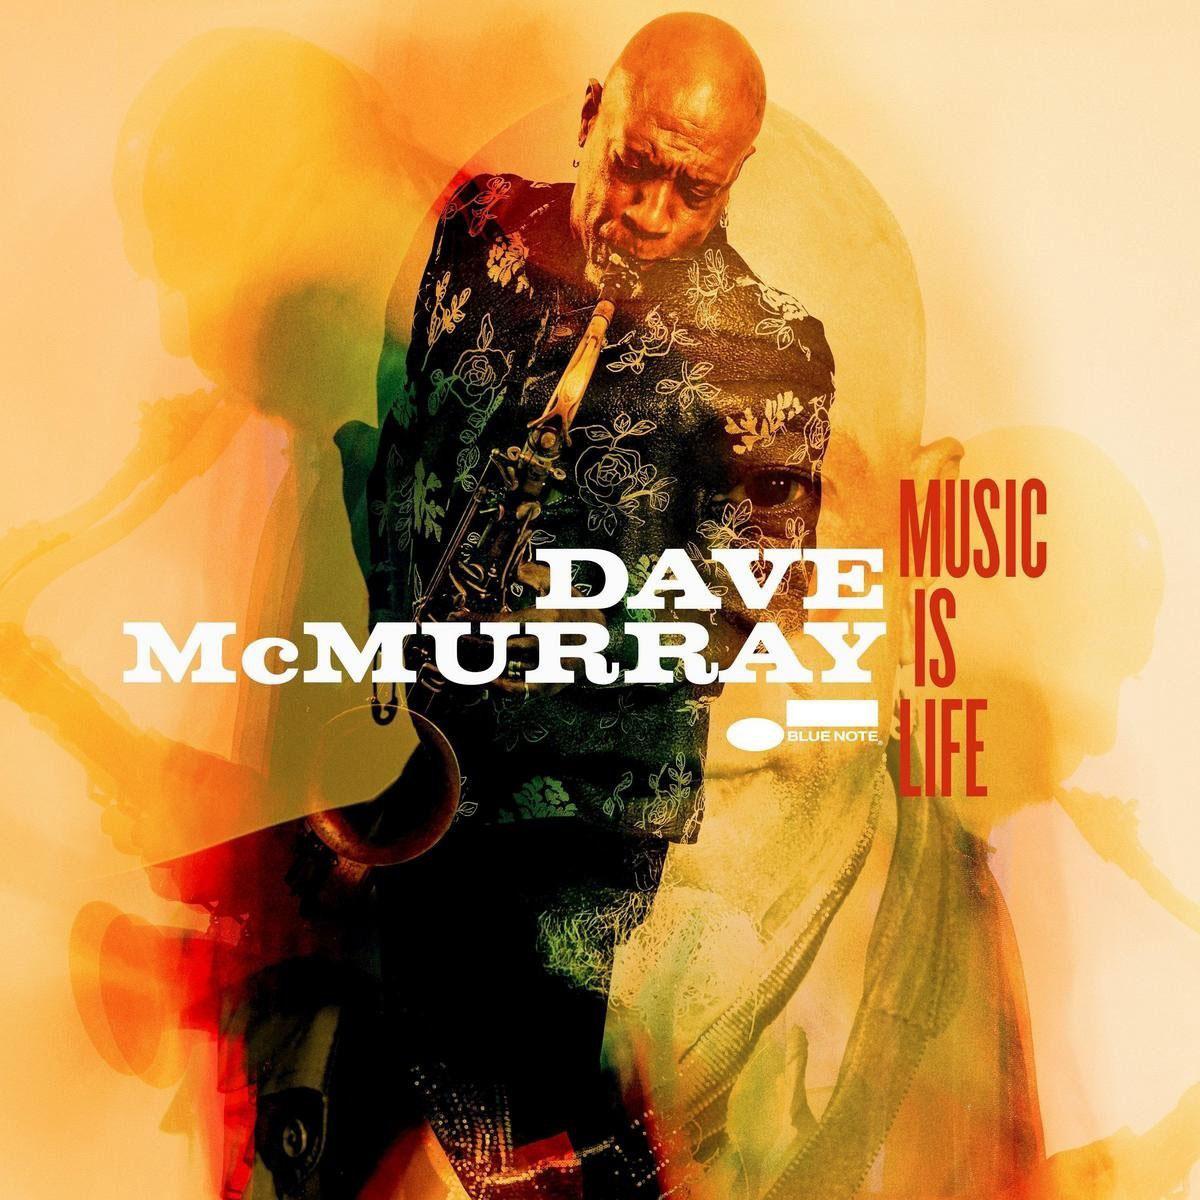 купить Dave McMurray Dave McMurray. Music Is Life по цене 1213 рублей